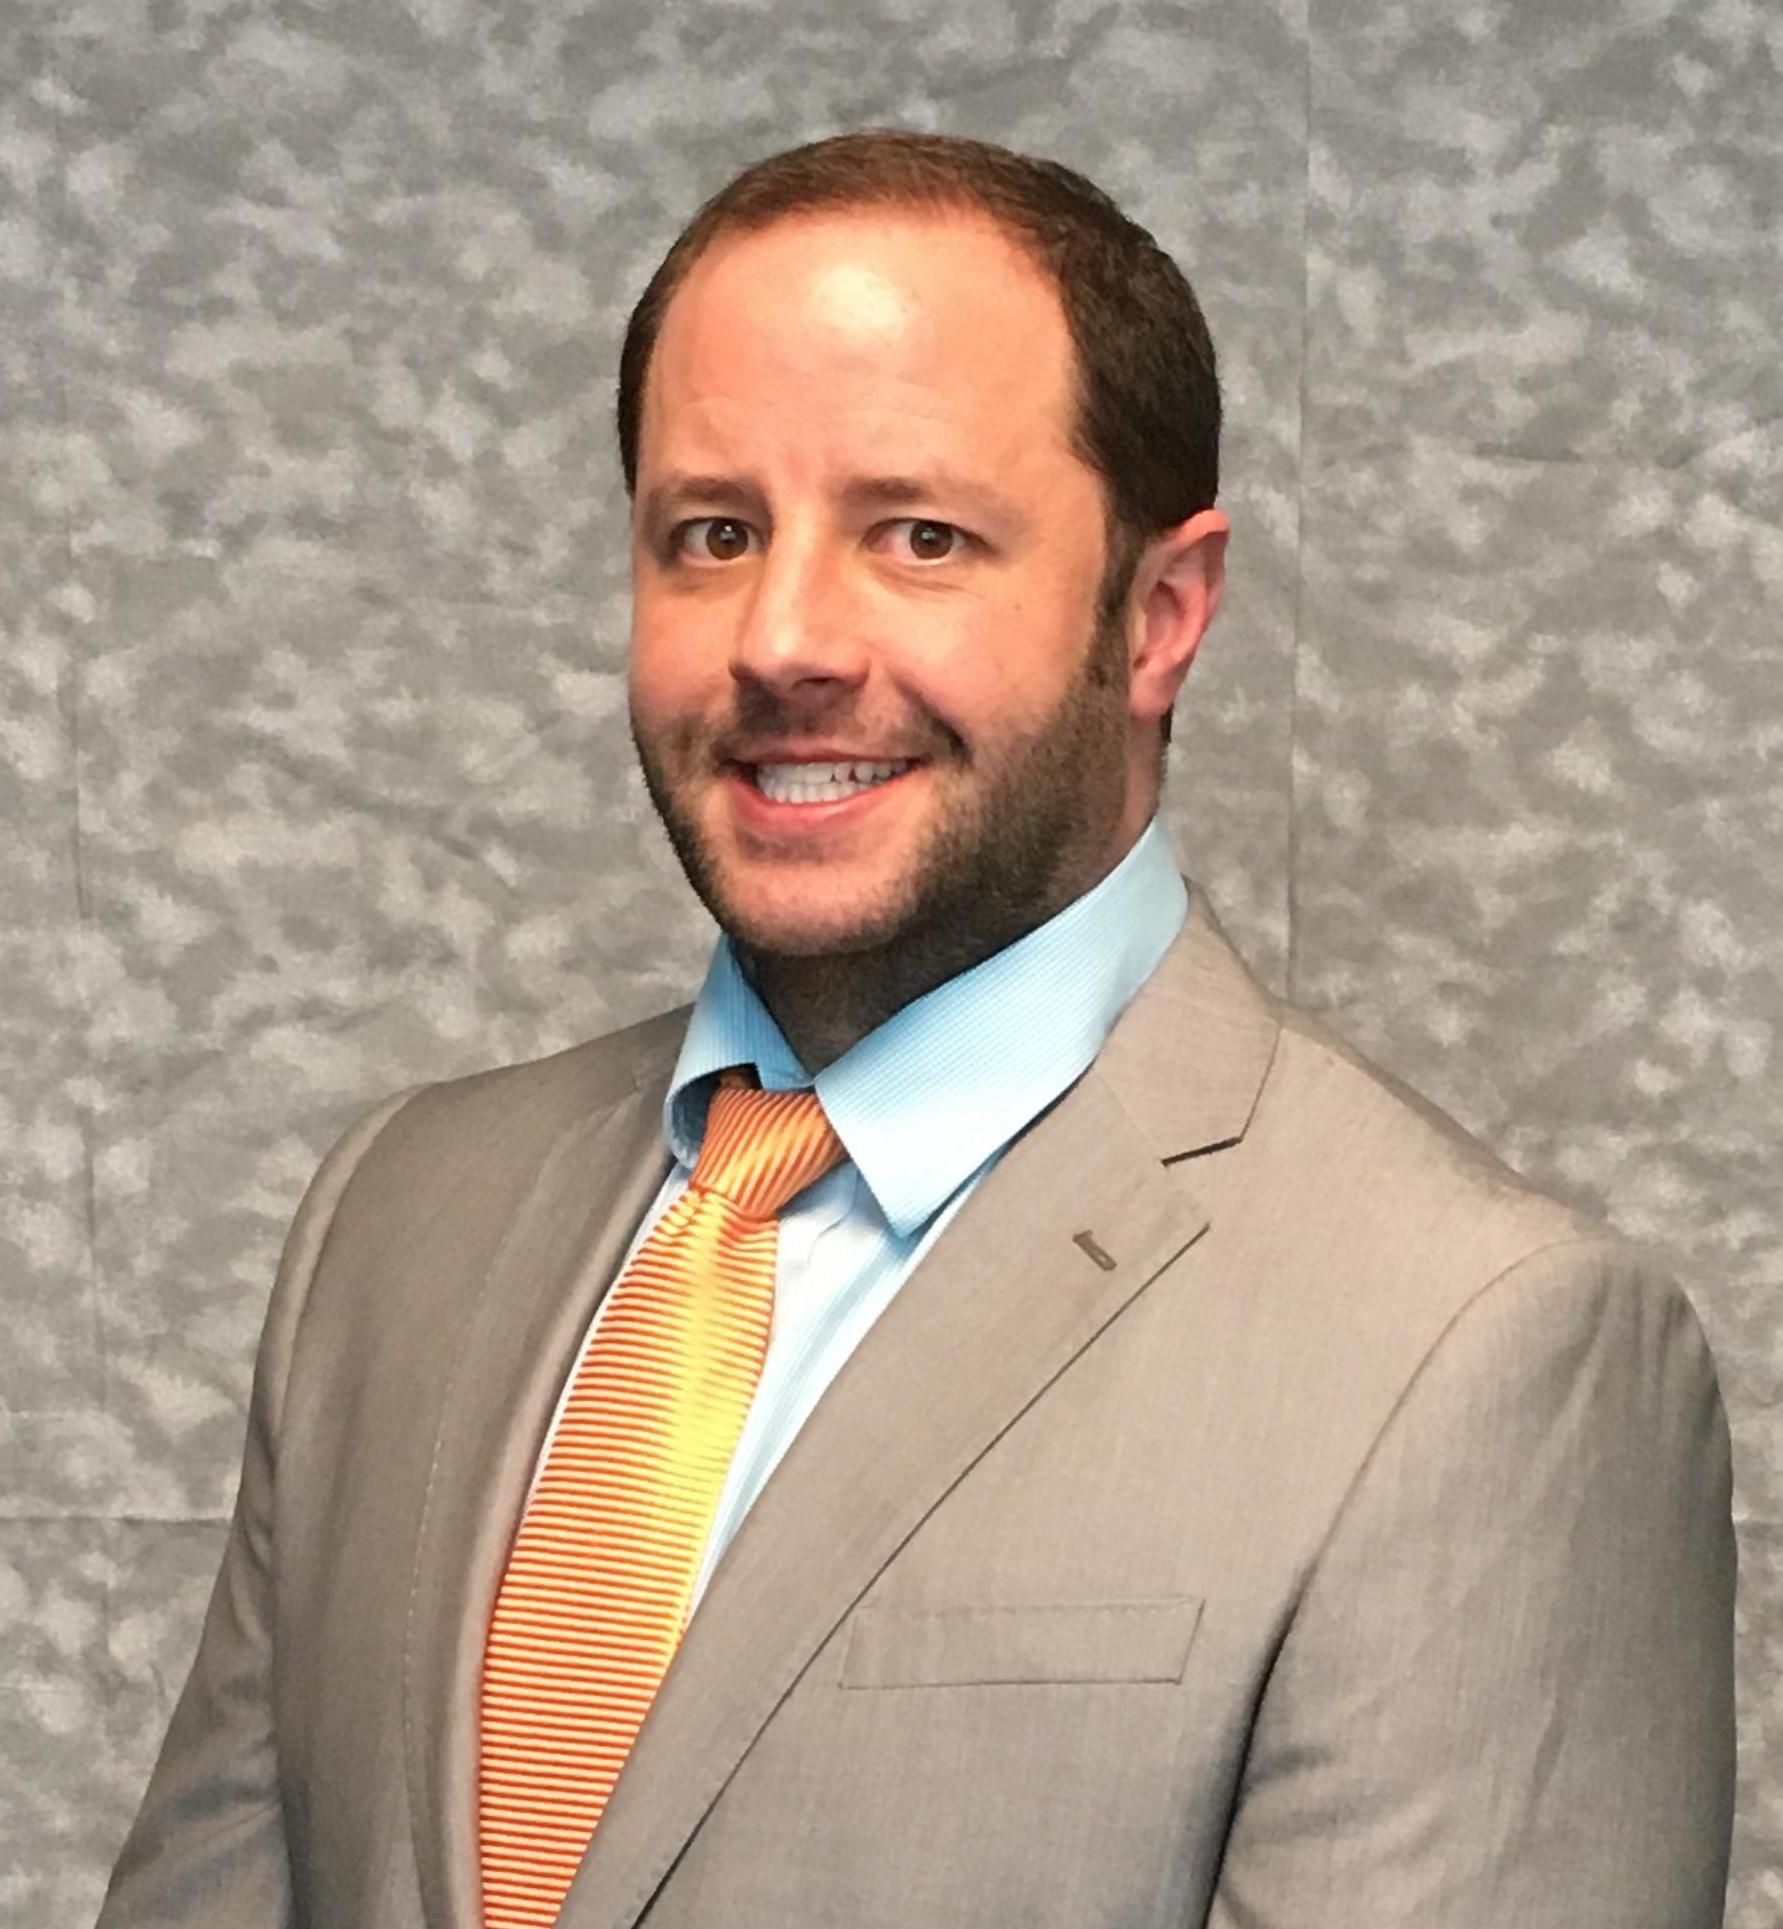 Photo of Mr. Zac Christensen, CPPB, NIGP-CPP